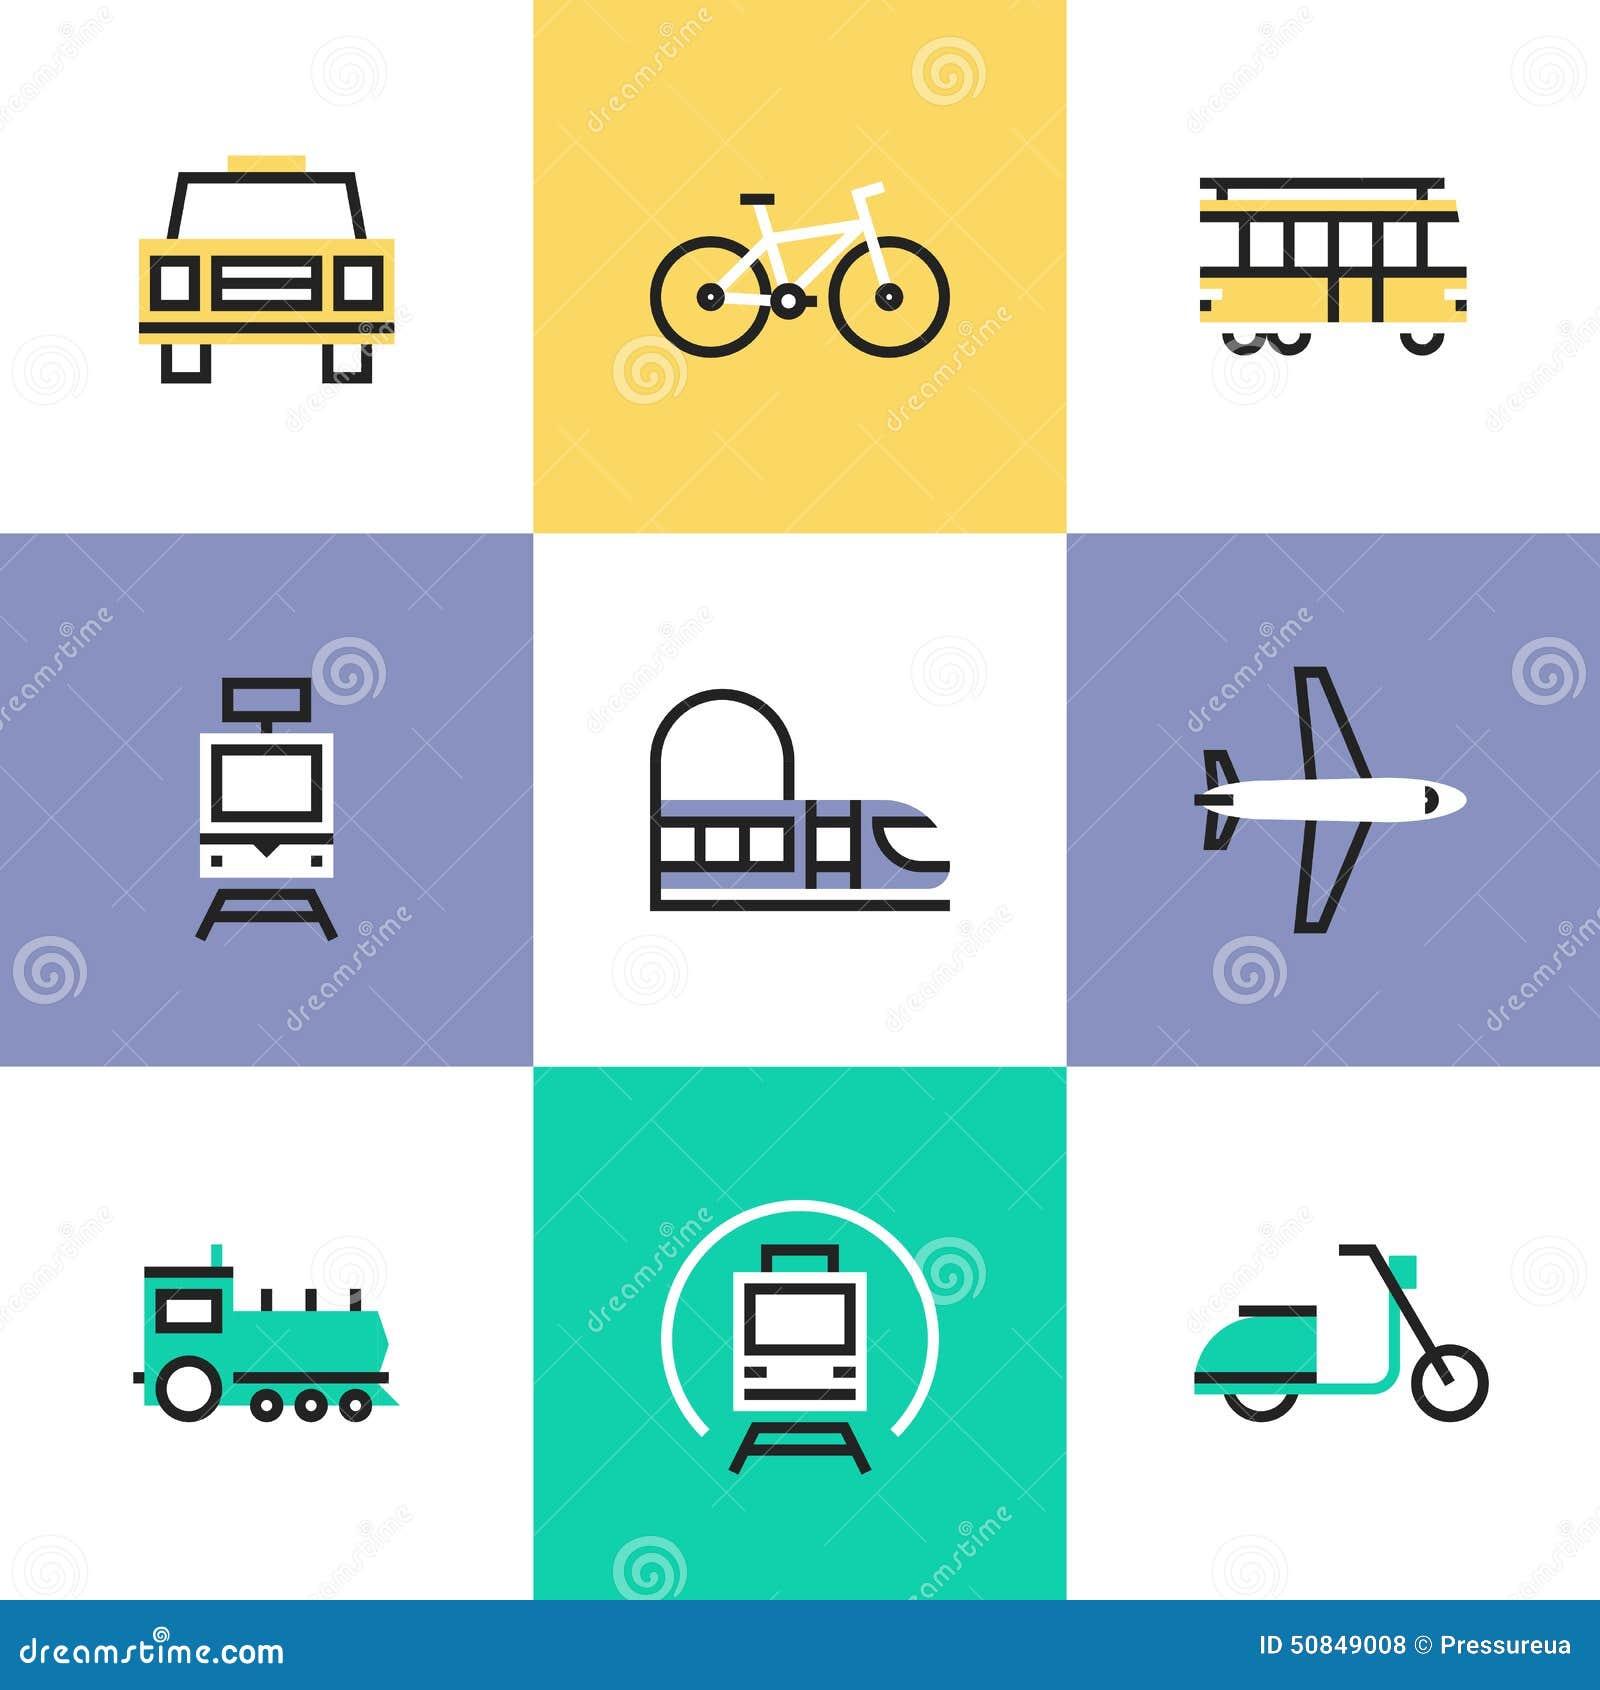 Public Transportation Pictogram Icons Set Stock Vector